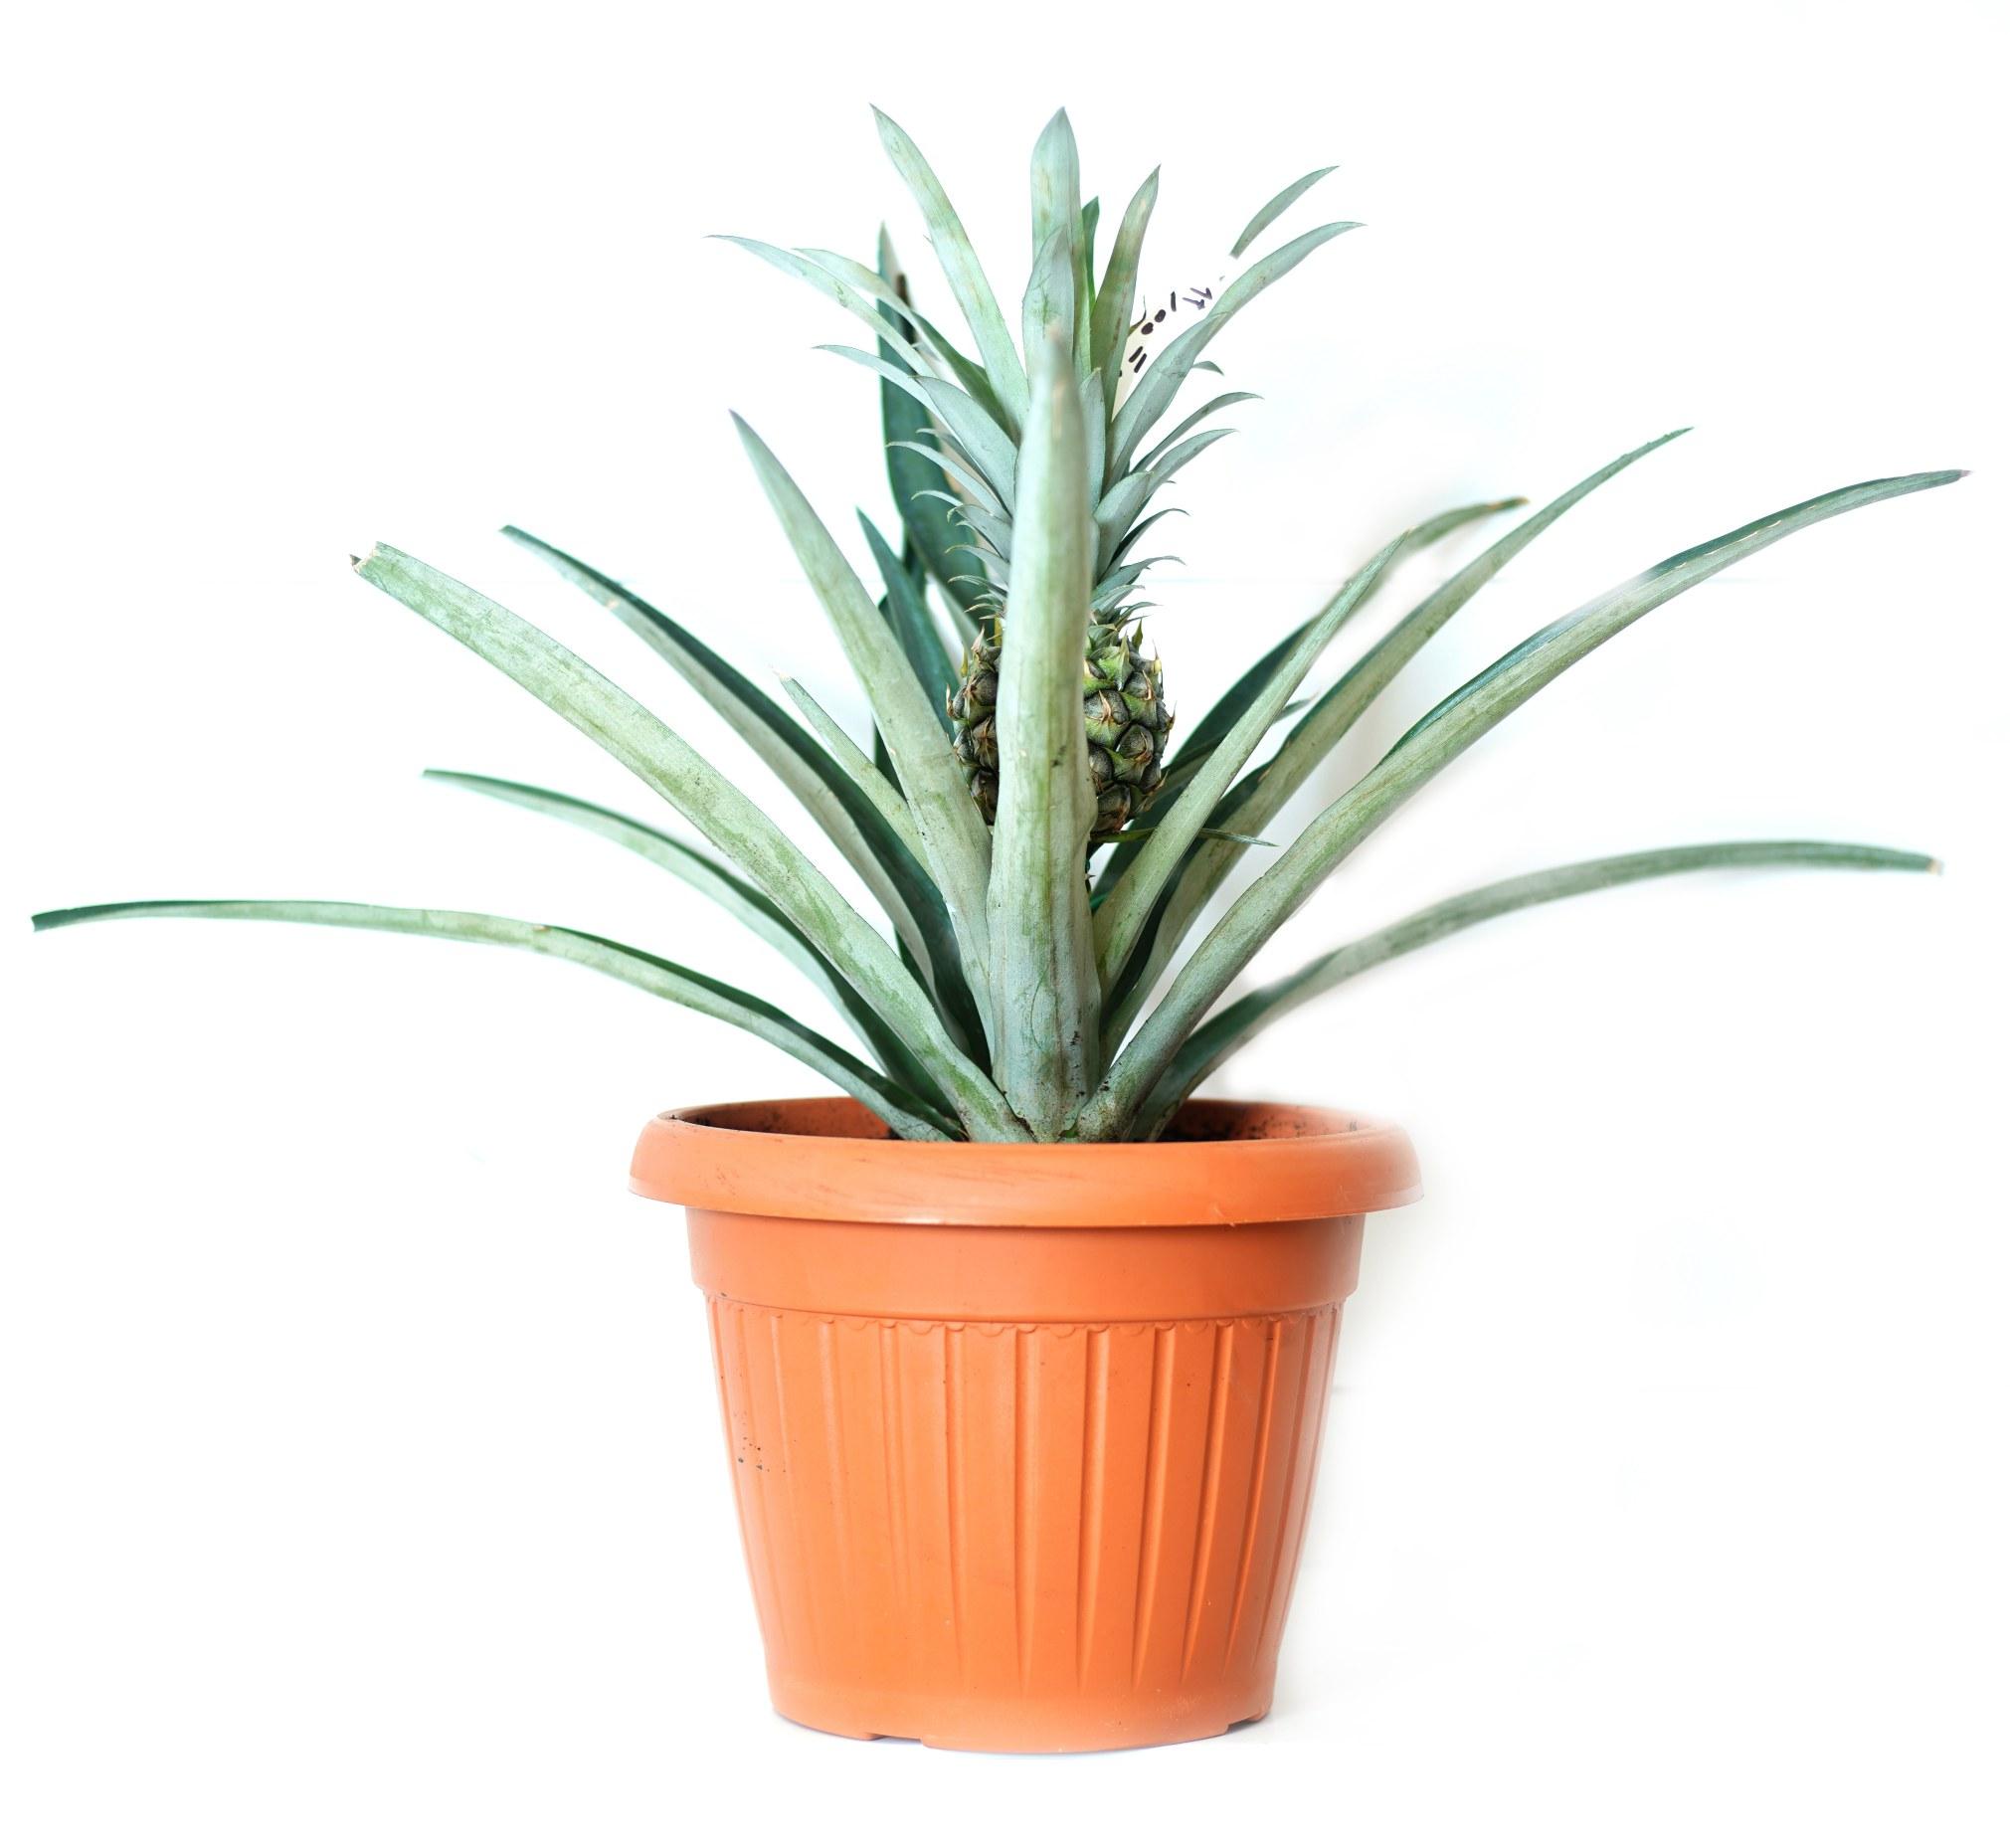 Ananas Pineapple Outdoor Plants